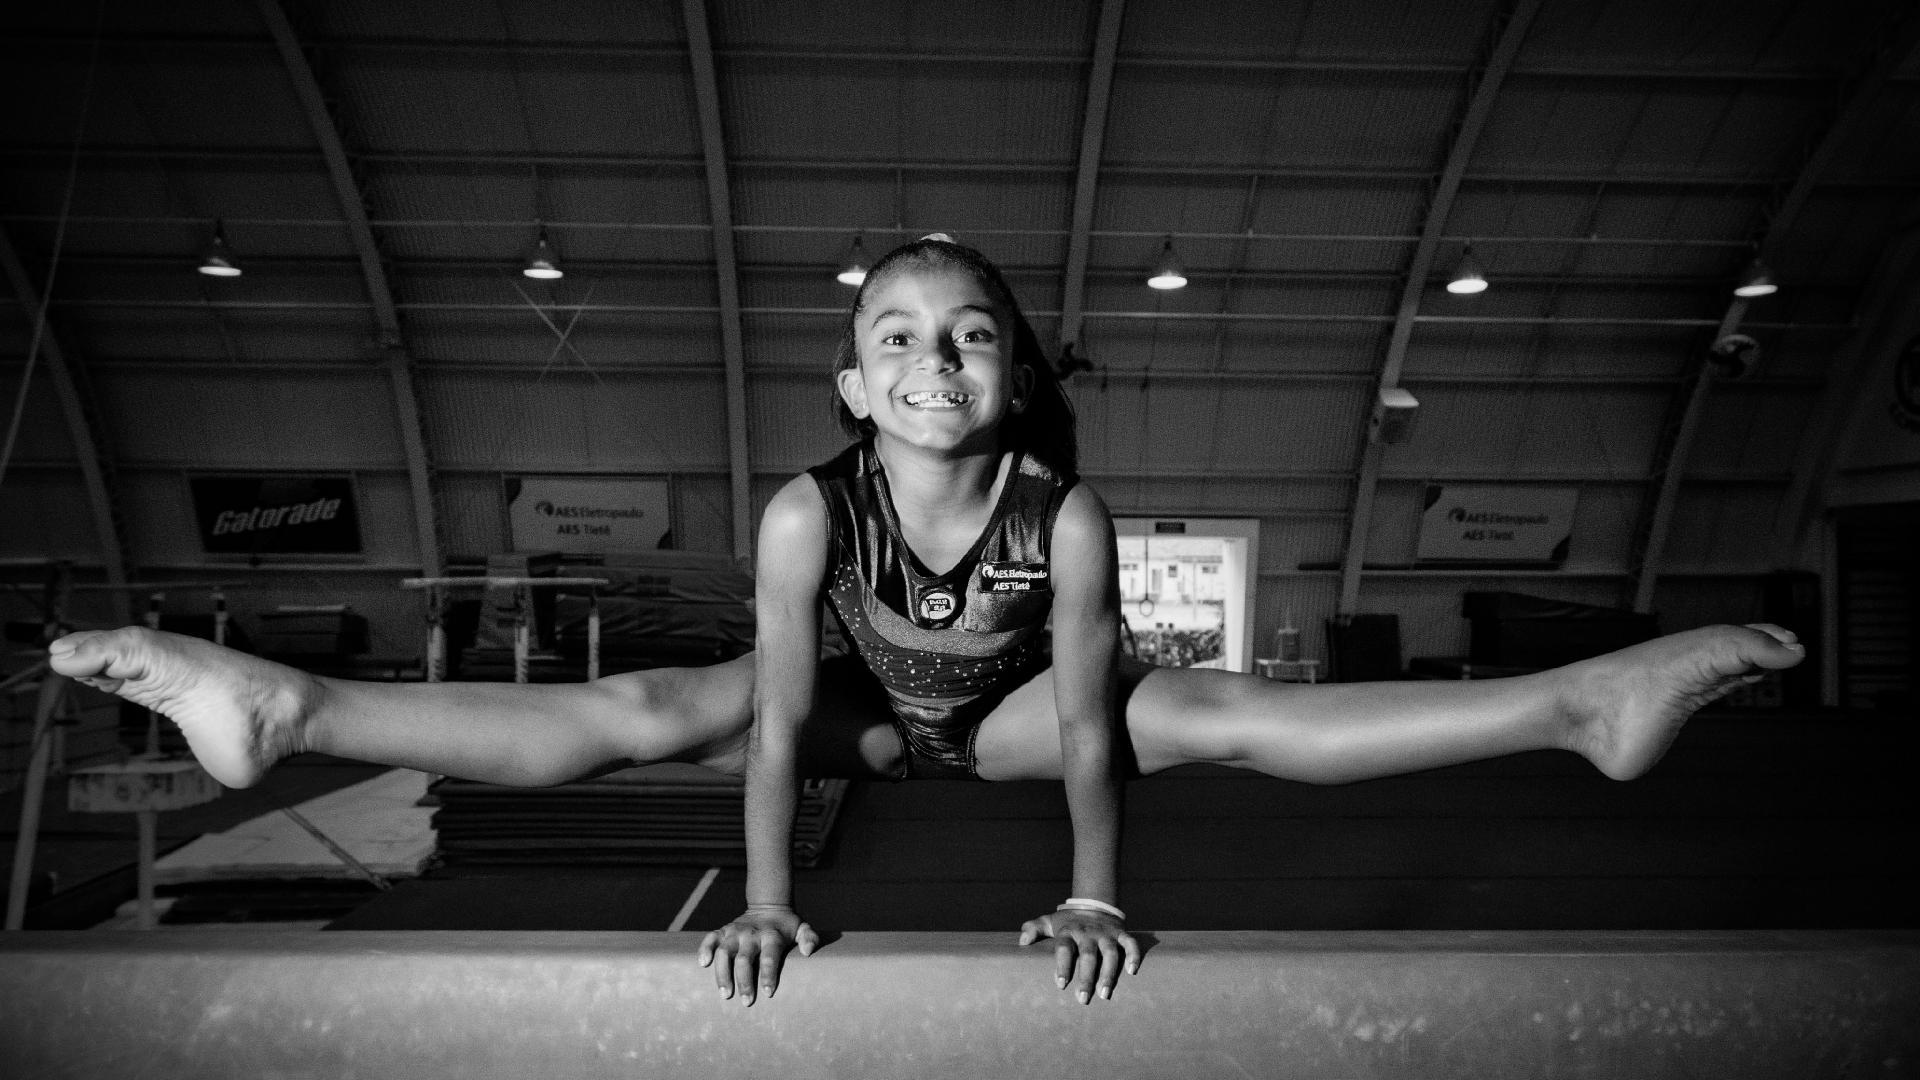 Retrato de Jackelyne aos 10 anos de idade. Foto: Alessandro Shinoda/Folhapress